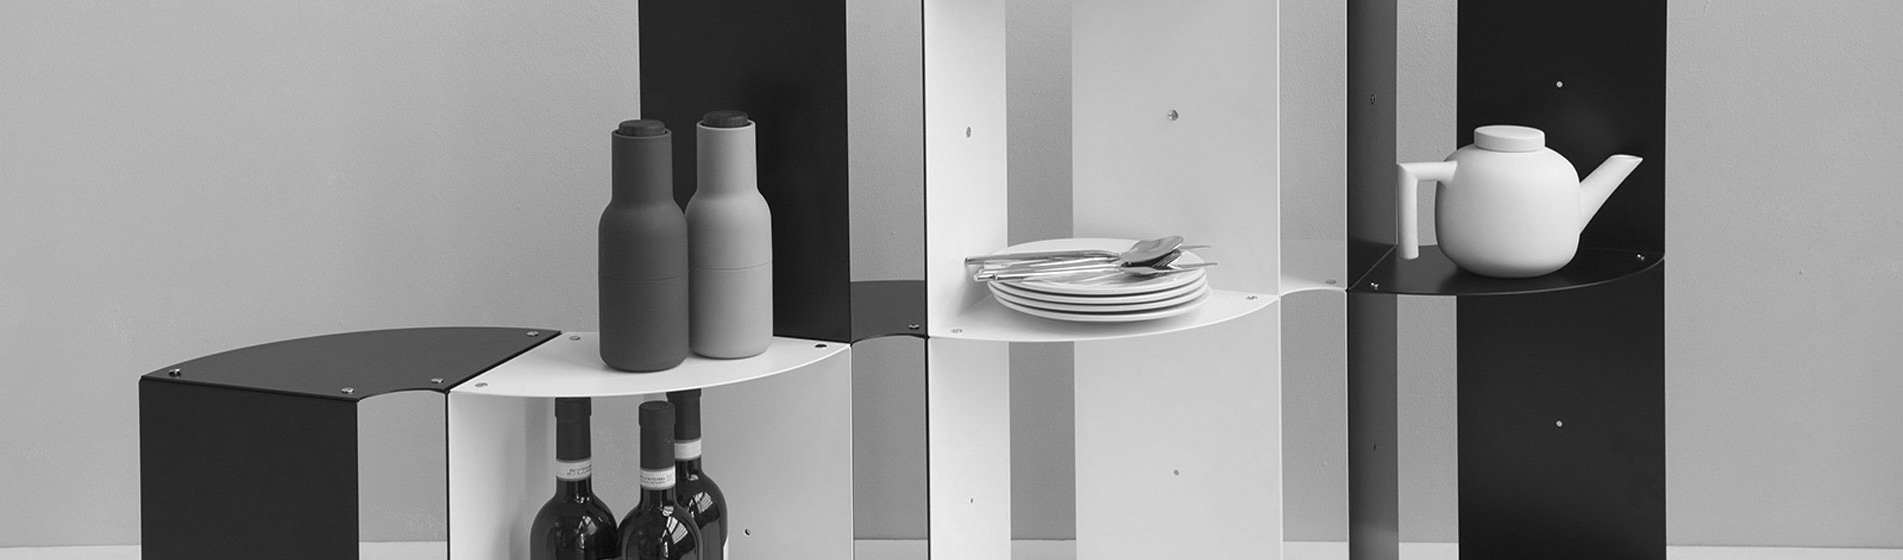 petite tag re d 39 angle paris teebooks. Black Bedroom Furniture Sets. Home Design Ideas